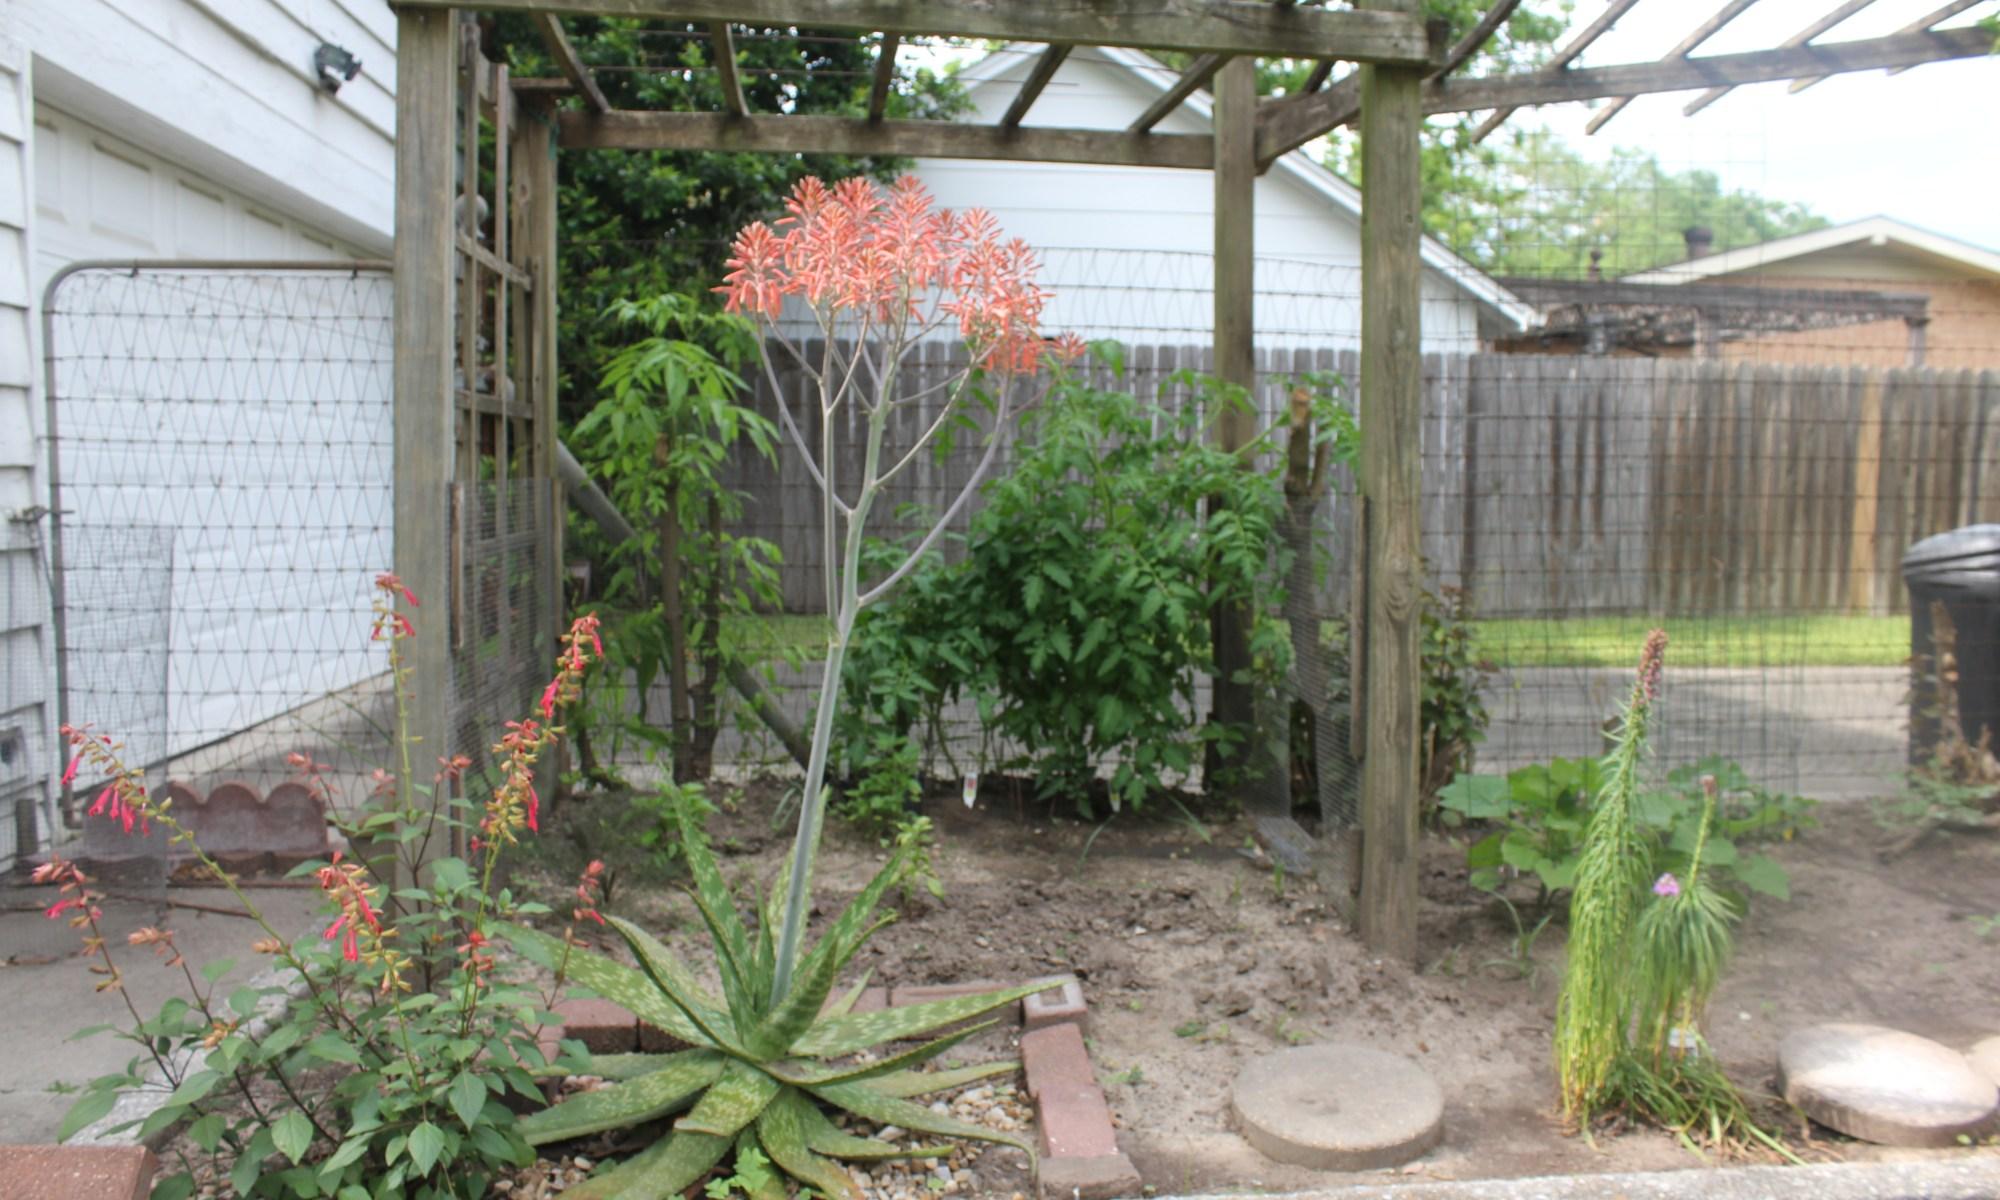 Aloe maculata in bloom